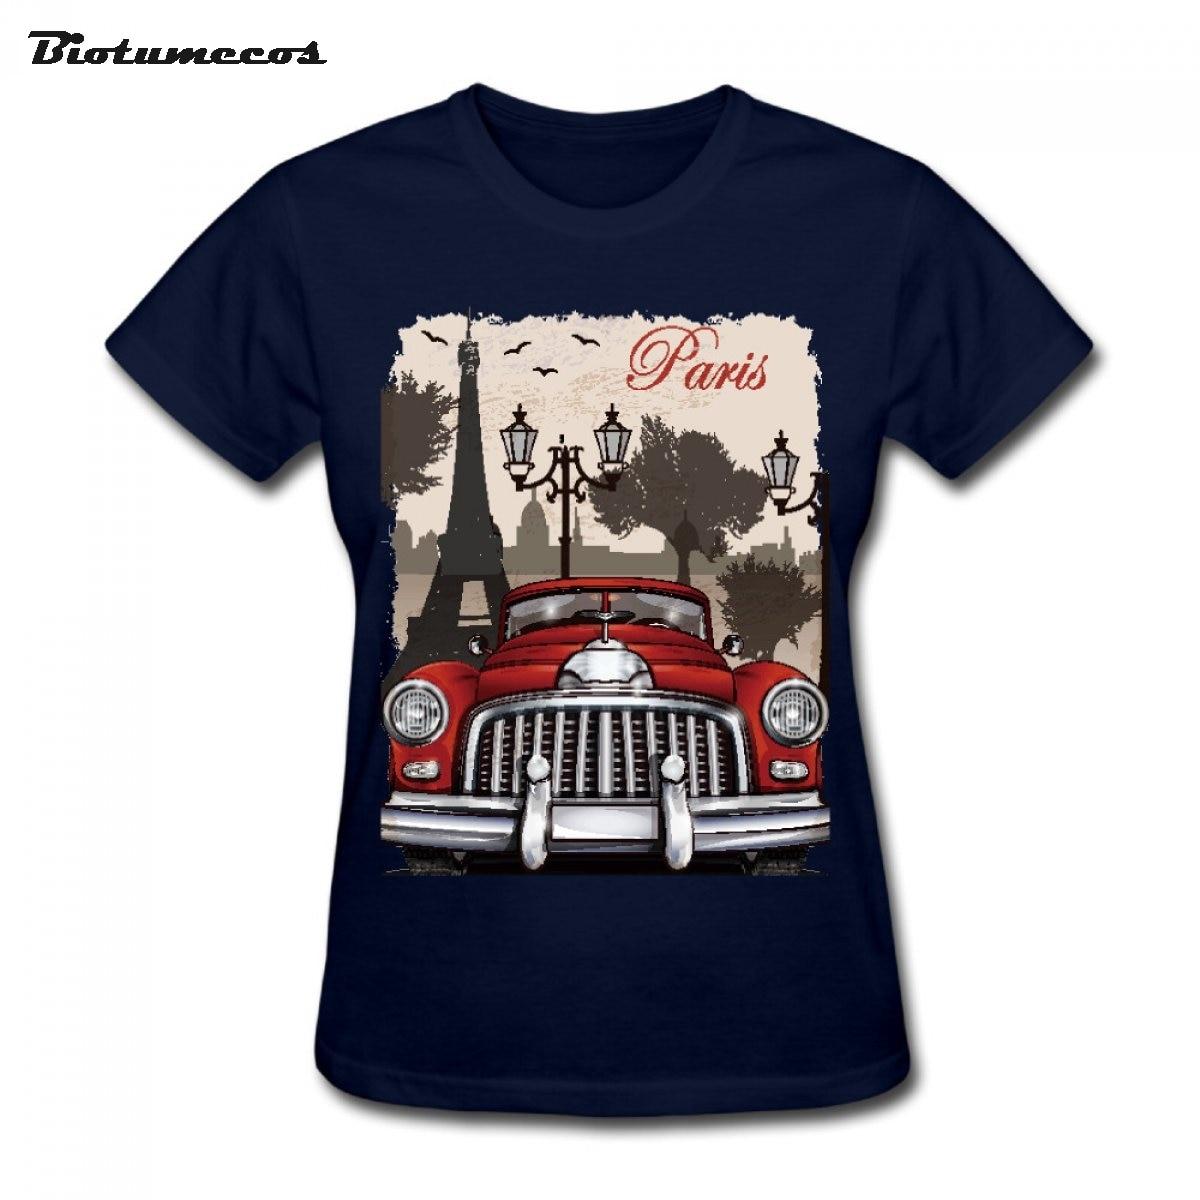 Design t shirt motor - New Design Women T Shirts Paris Tower Of London Bubble Car Printed T Shirt Brand